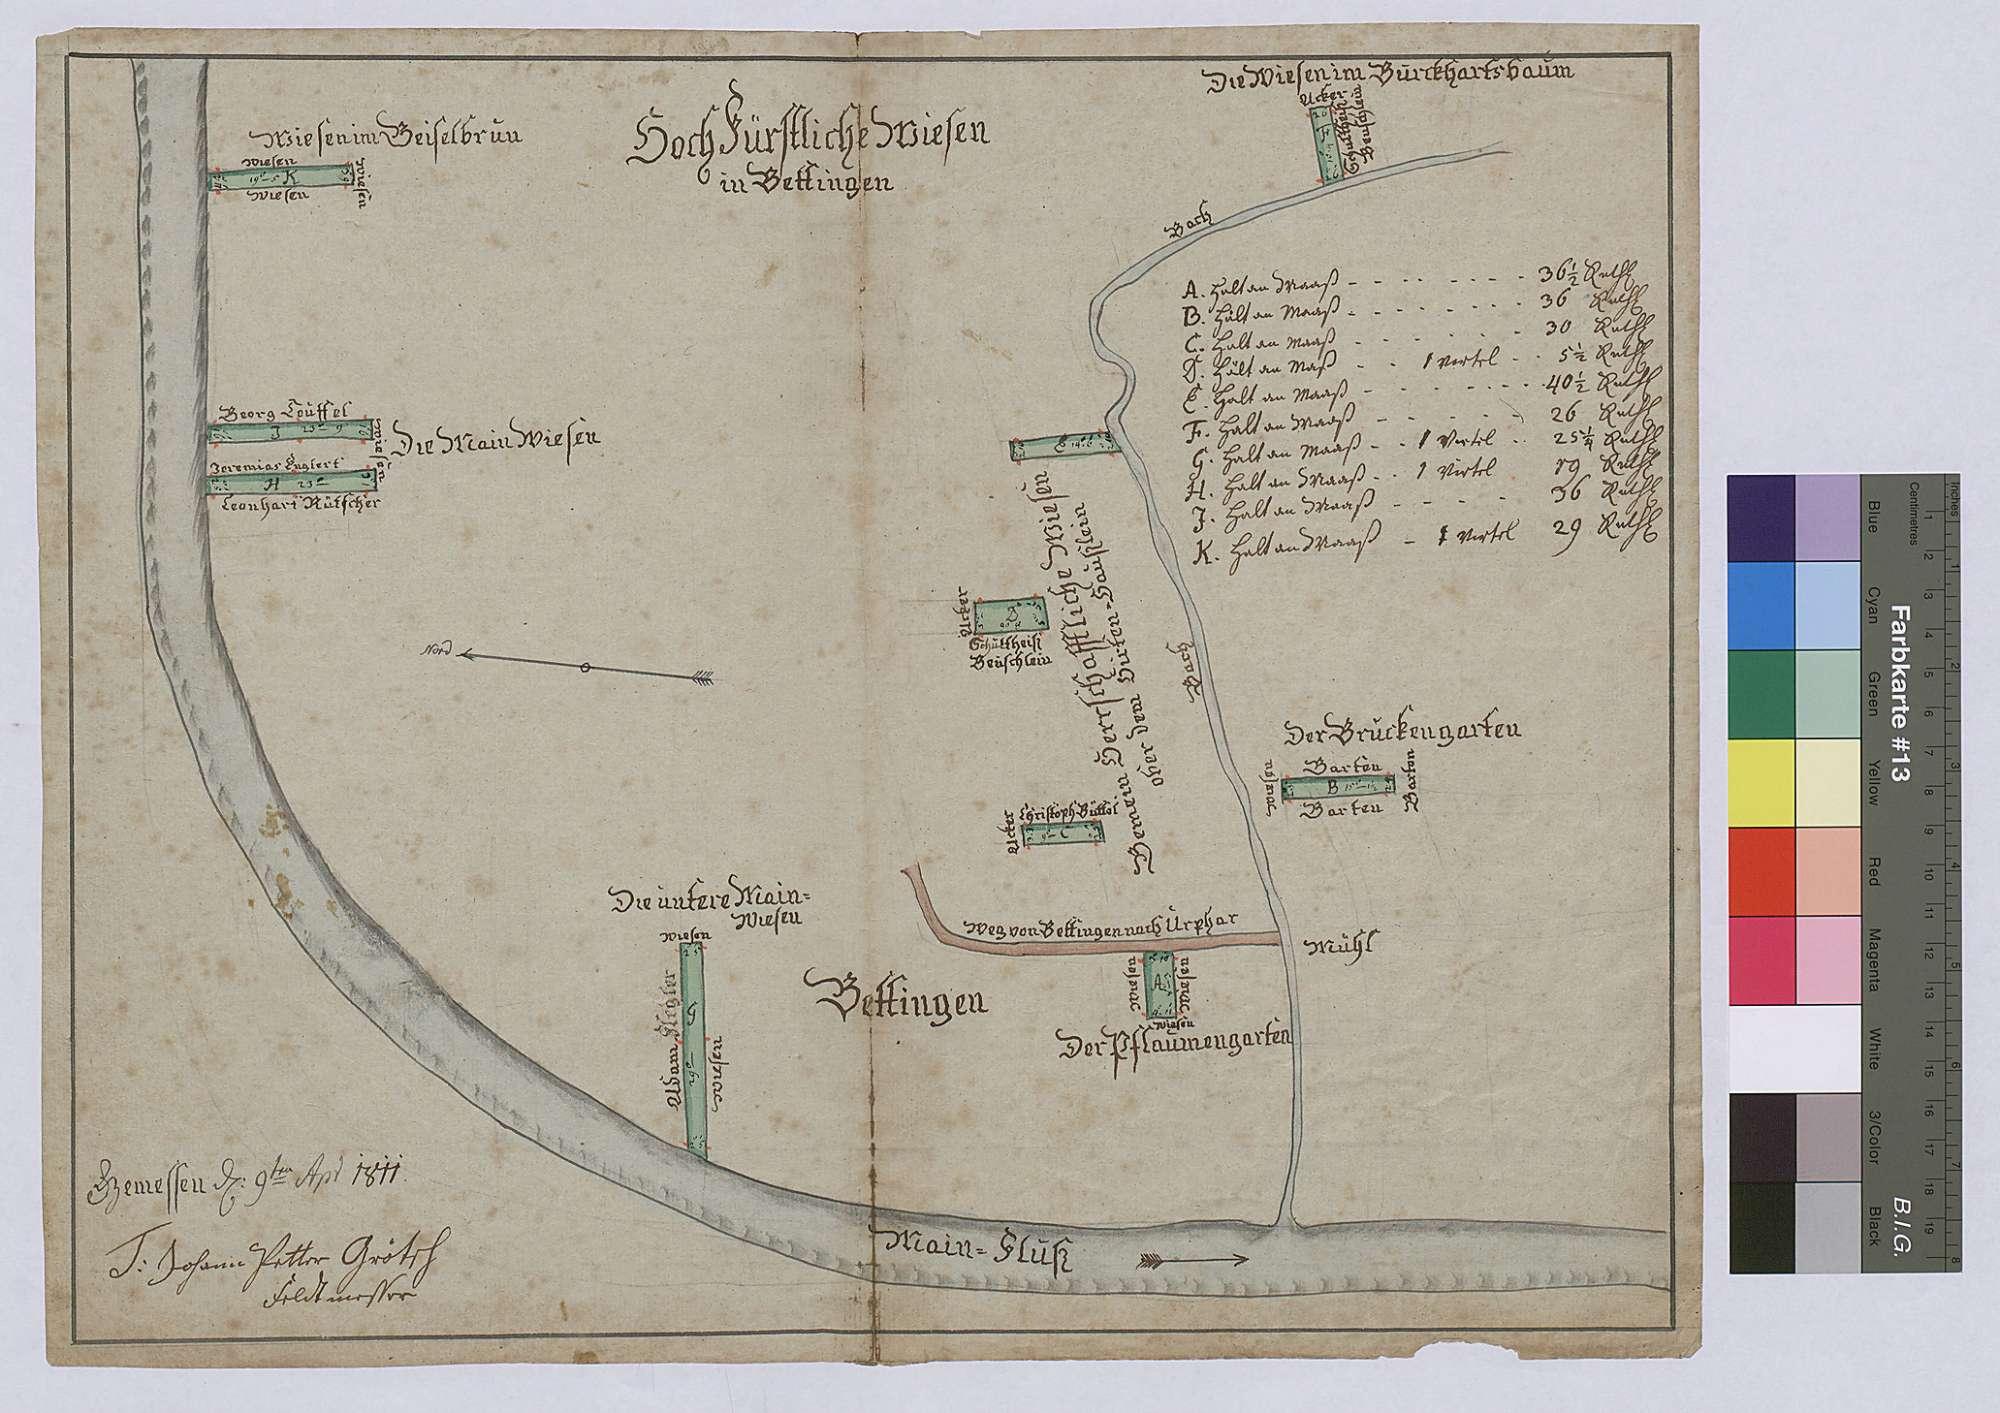 Wiesen in Bettingen (Inselkarte), Bild 1